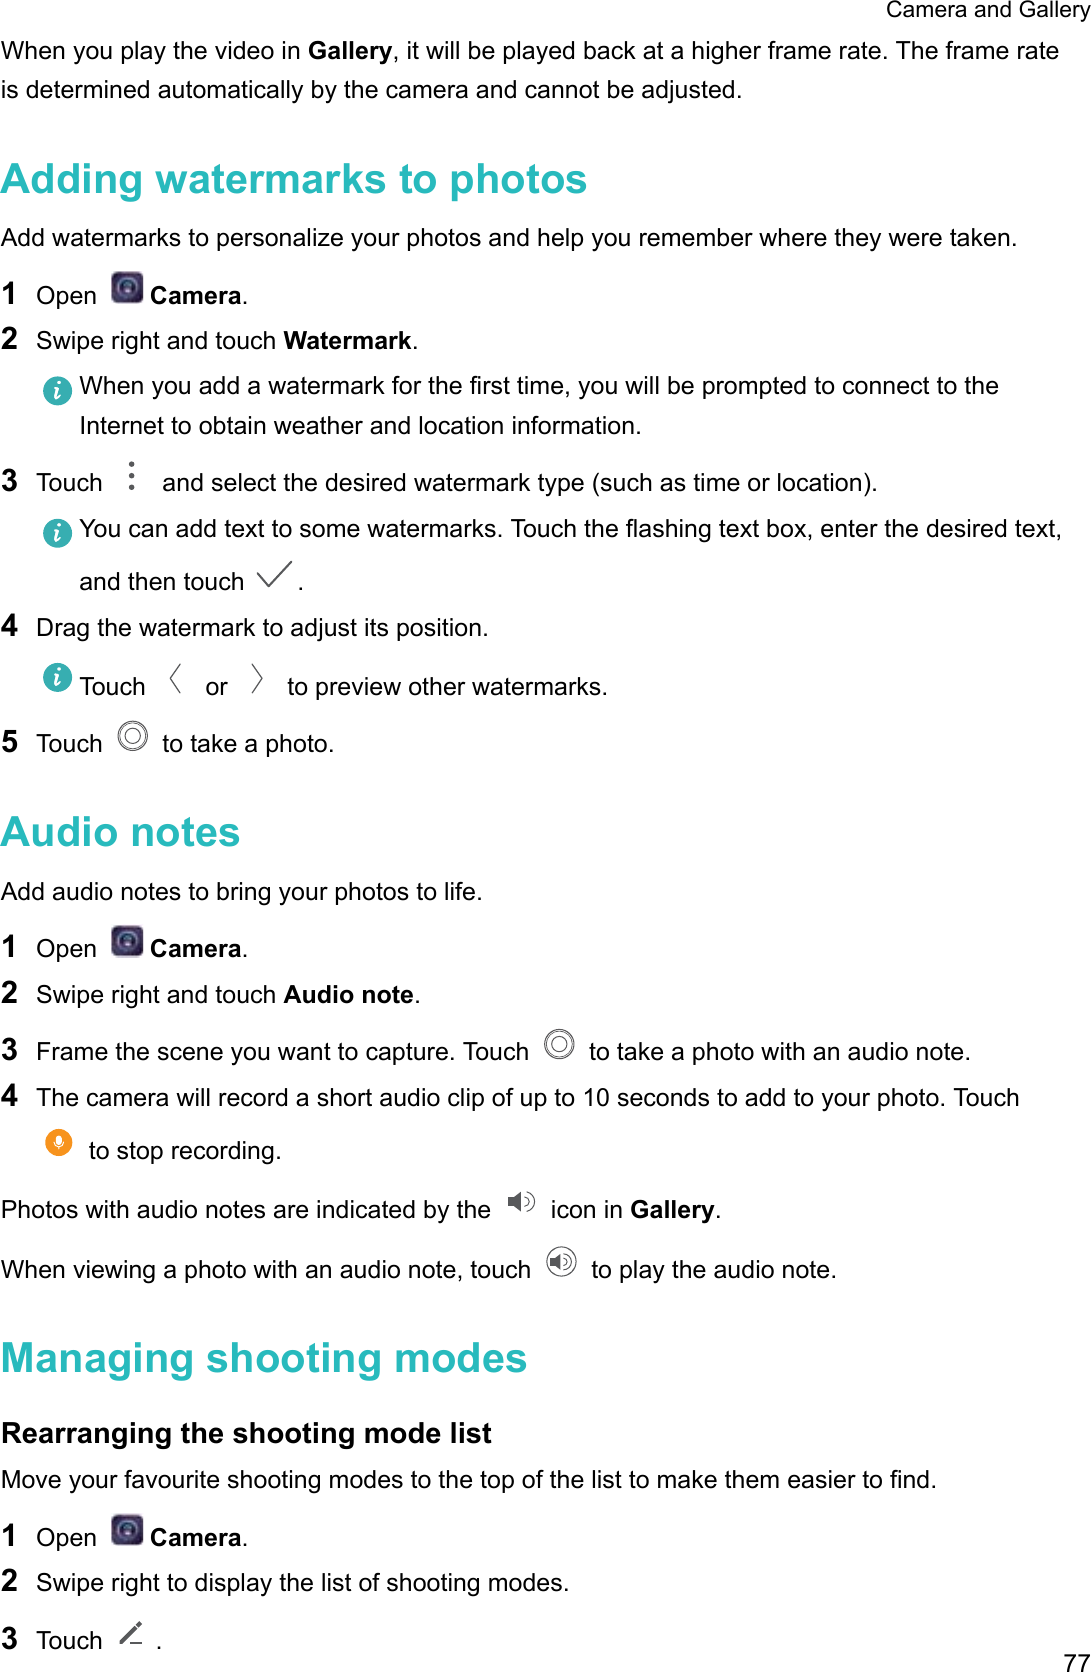 Huawei P10 User Guide (VTR L09, 01, IE)